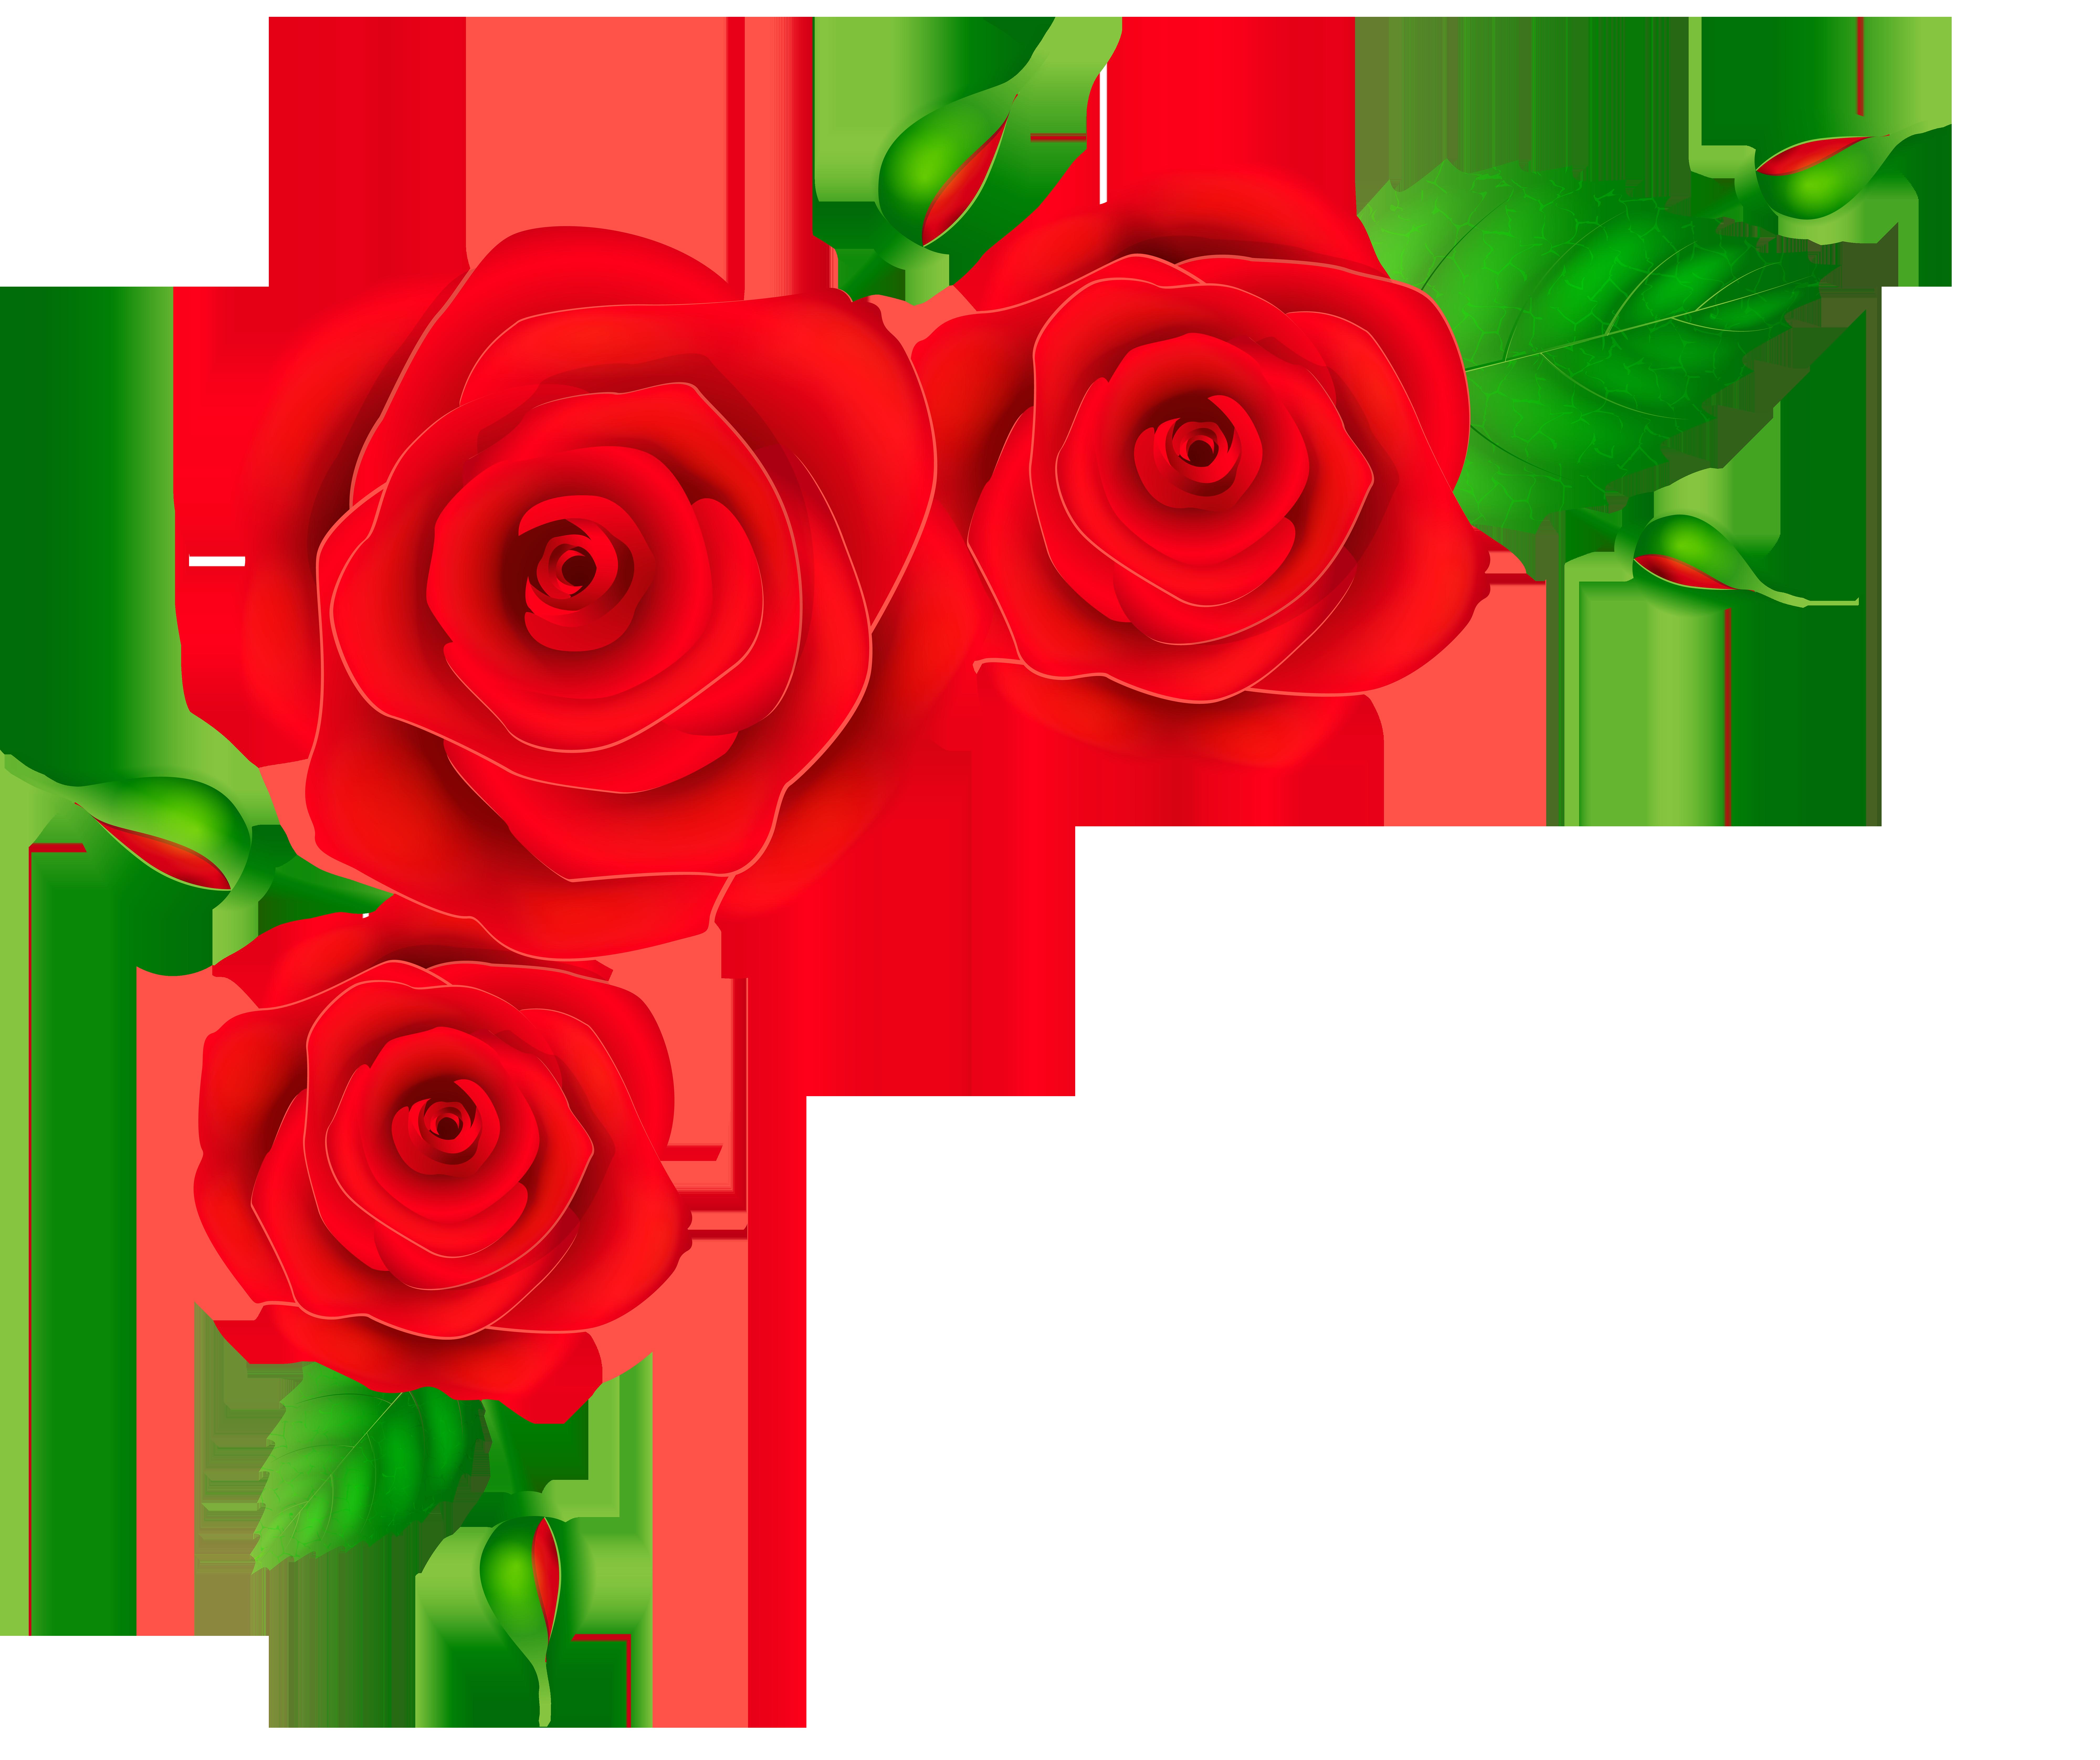 Red Roses Corner Transparent PNG Clip Art Image | Flowery ...